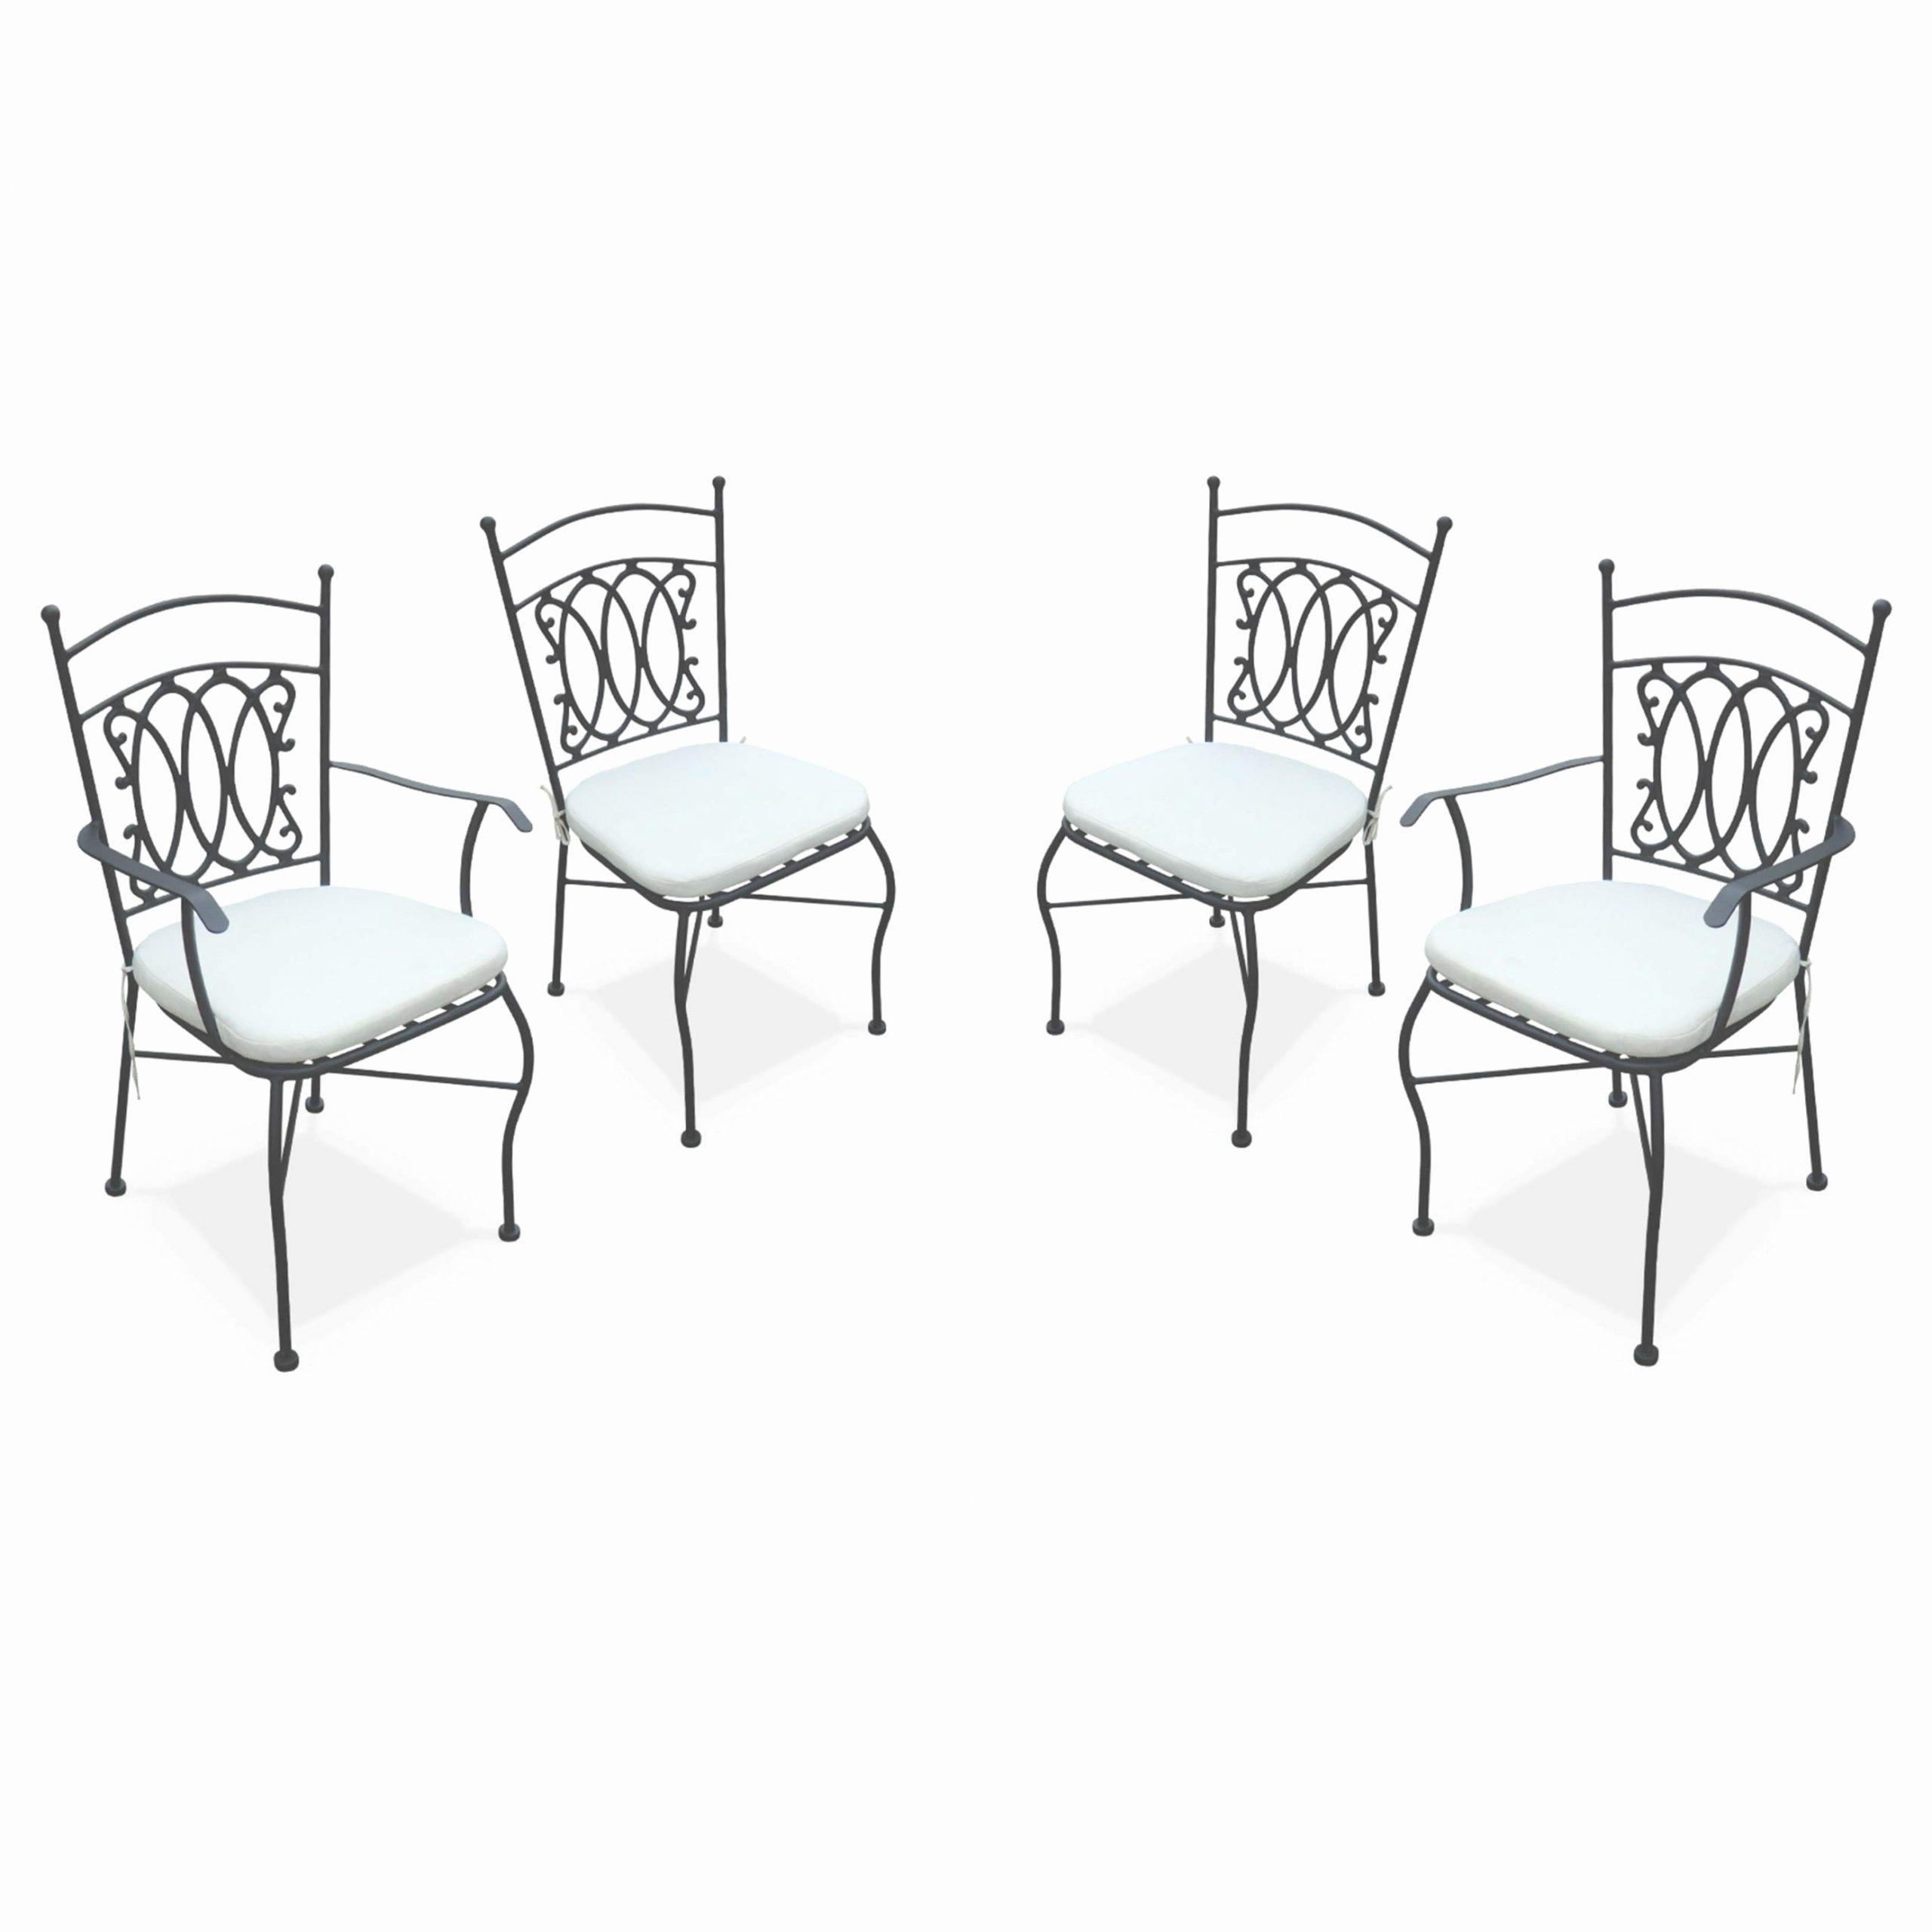 Chaise De Jardin Aluminium Archives - Luckytroll avec Salon De Jardin En Fer Forgé